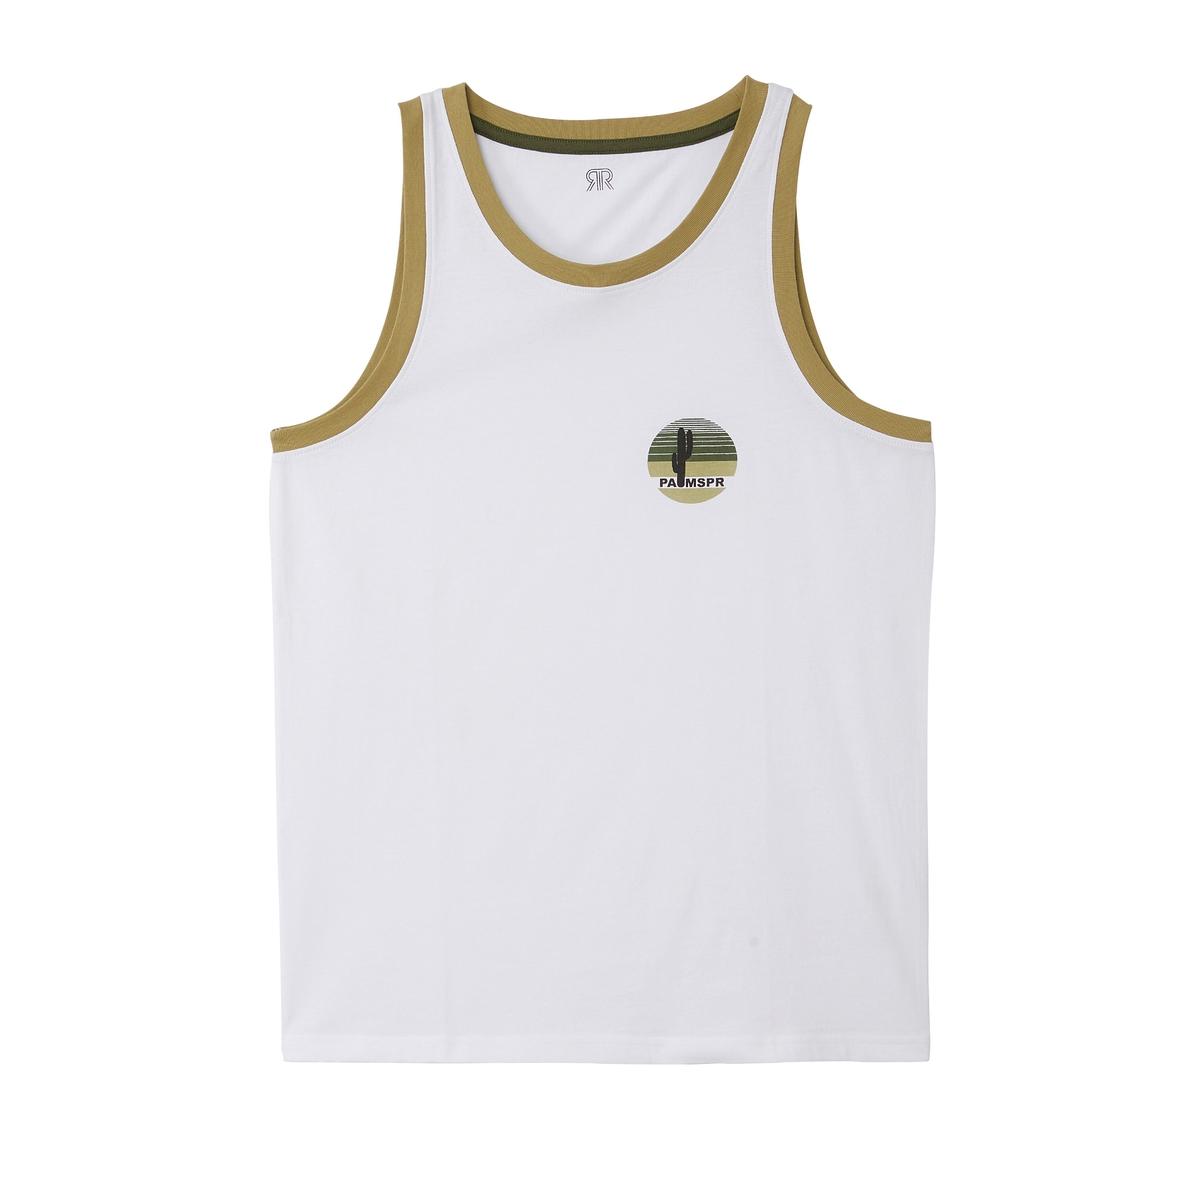 Camiseta sin mangas con cuello redondo